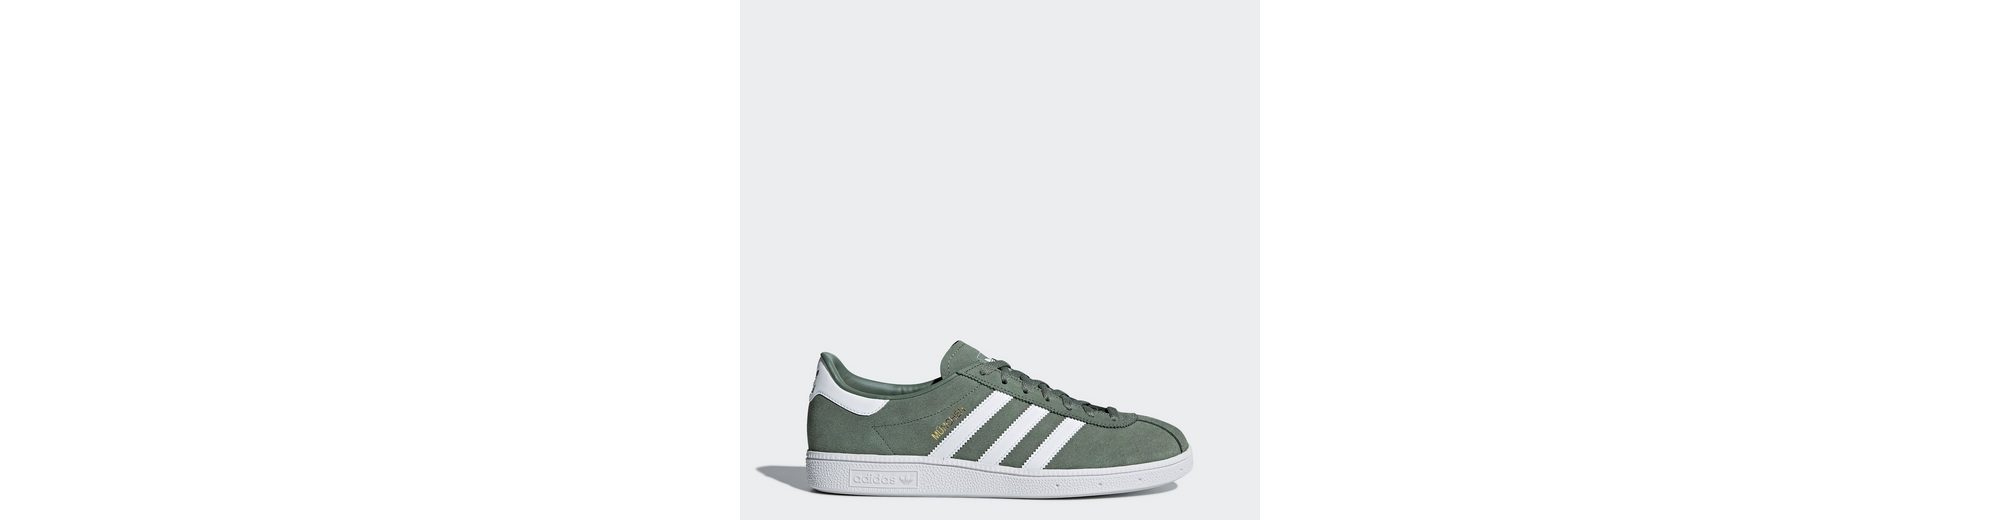 adidas Originals M眉nchen Schuh Sneaker